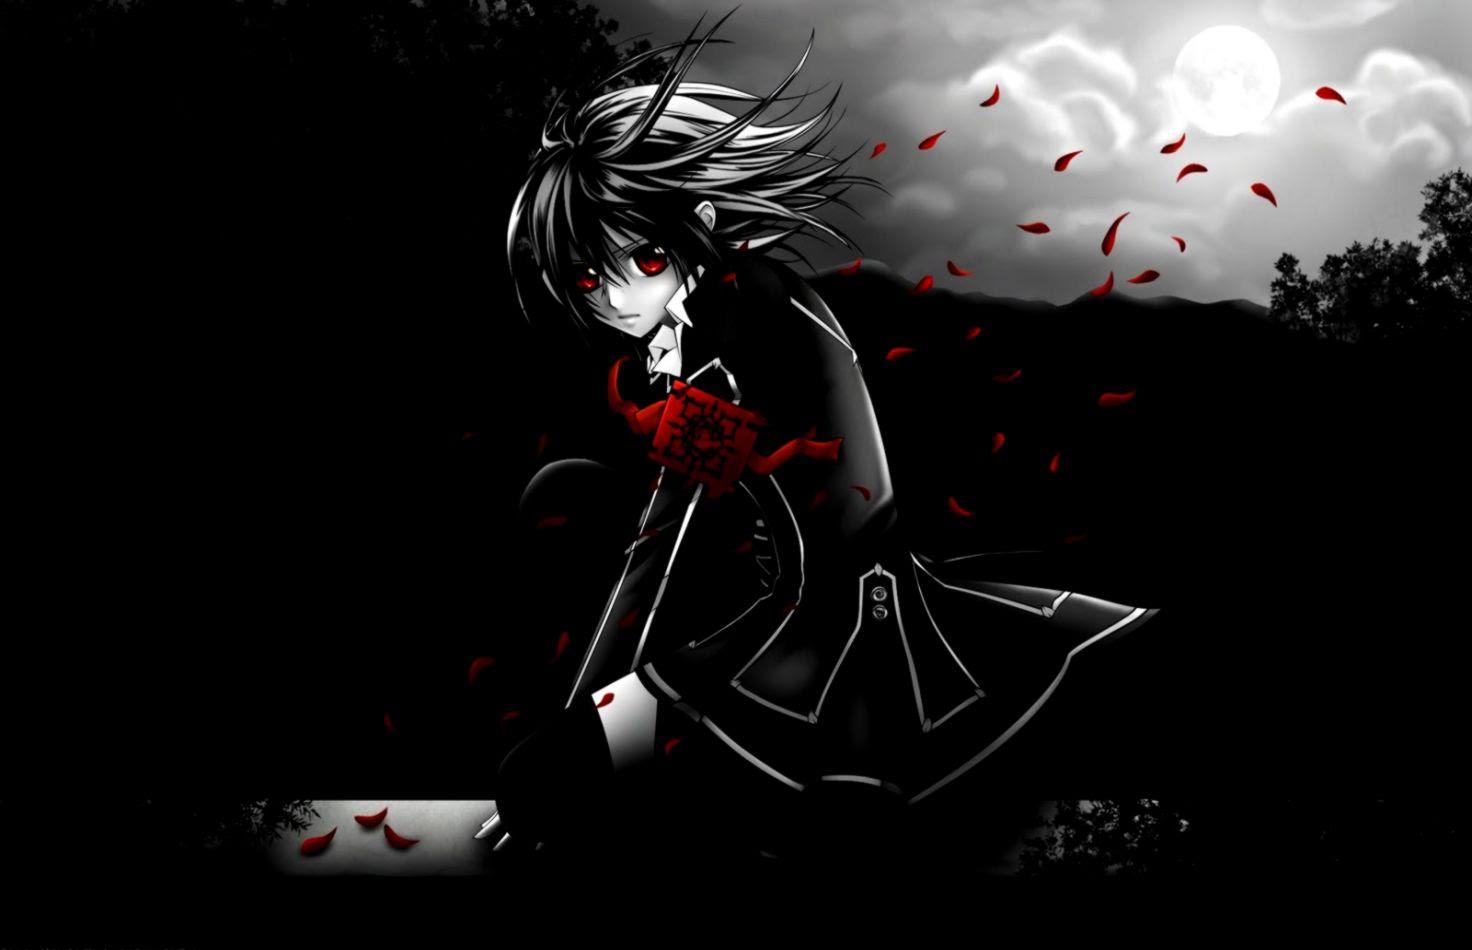 Download sad emo girl wallpaper anime emo alone night wallpaper all